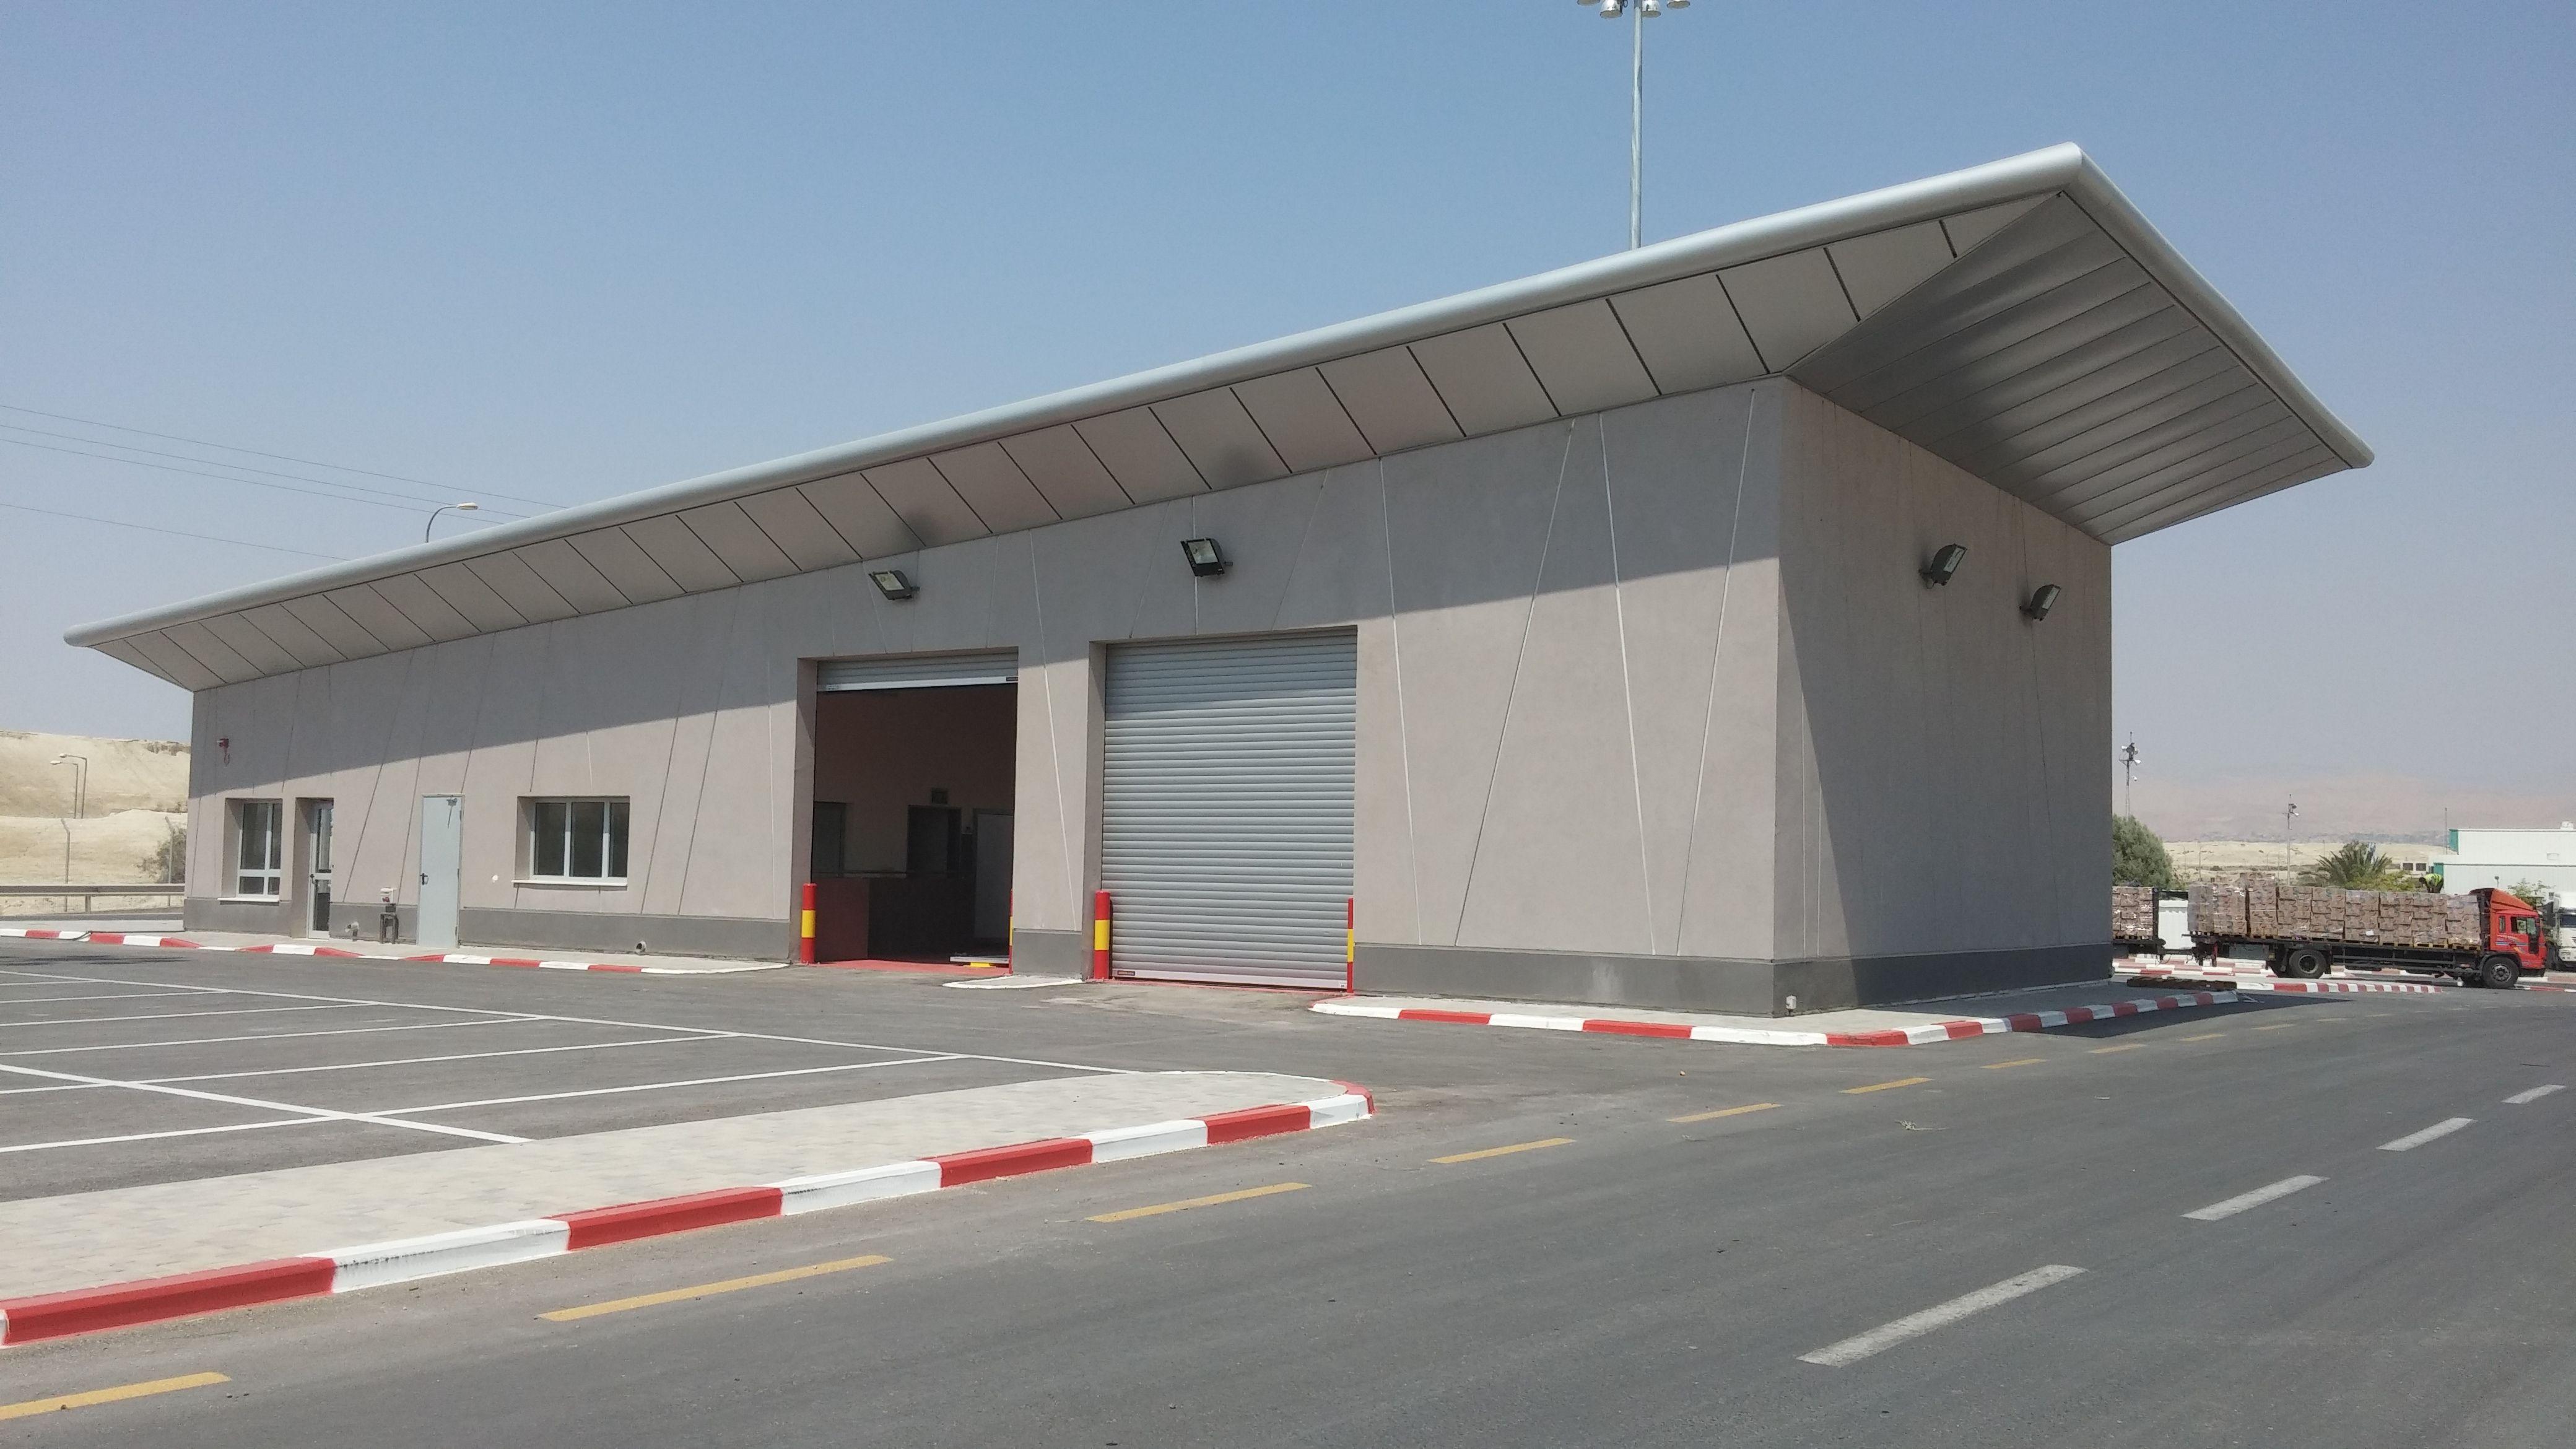 garage checking entered vehicles from jordan to israel. designed by Nir gamari  pelleg architects